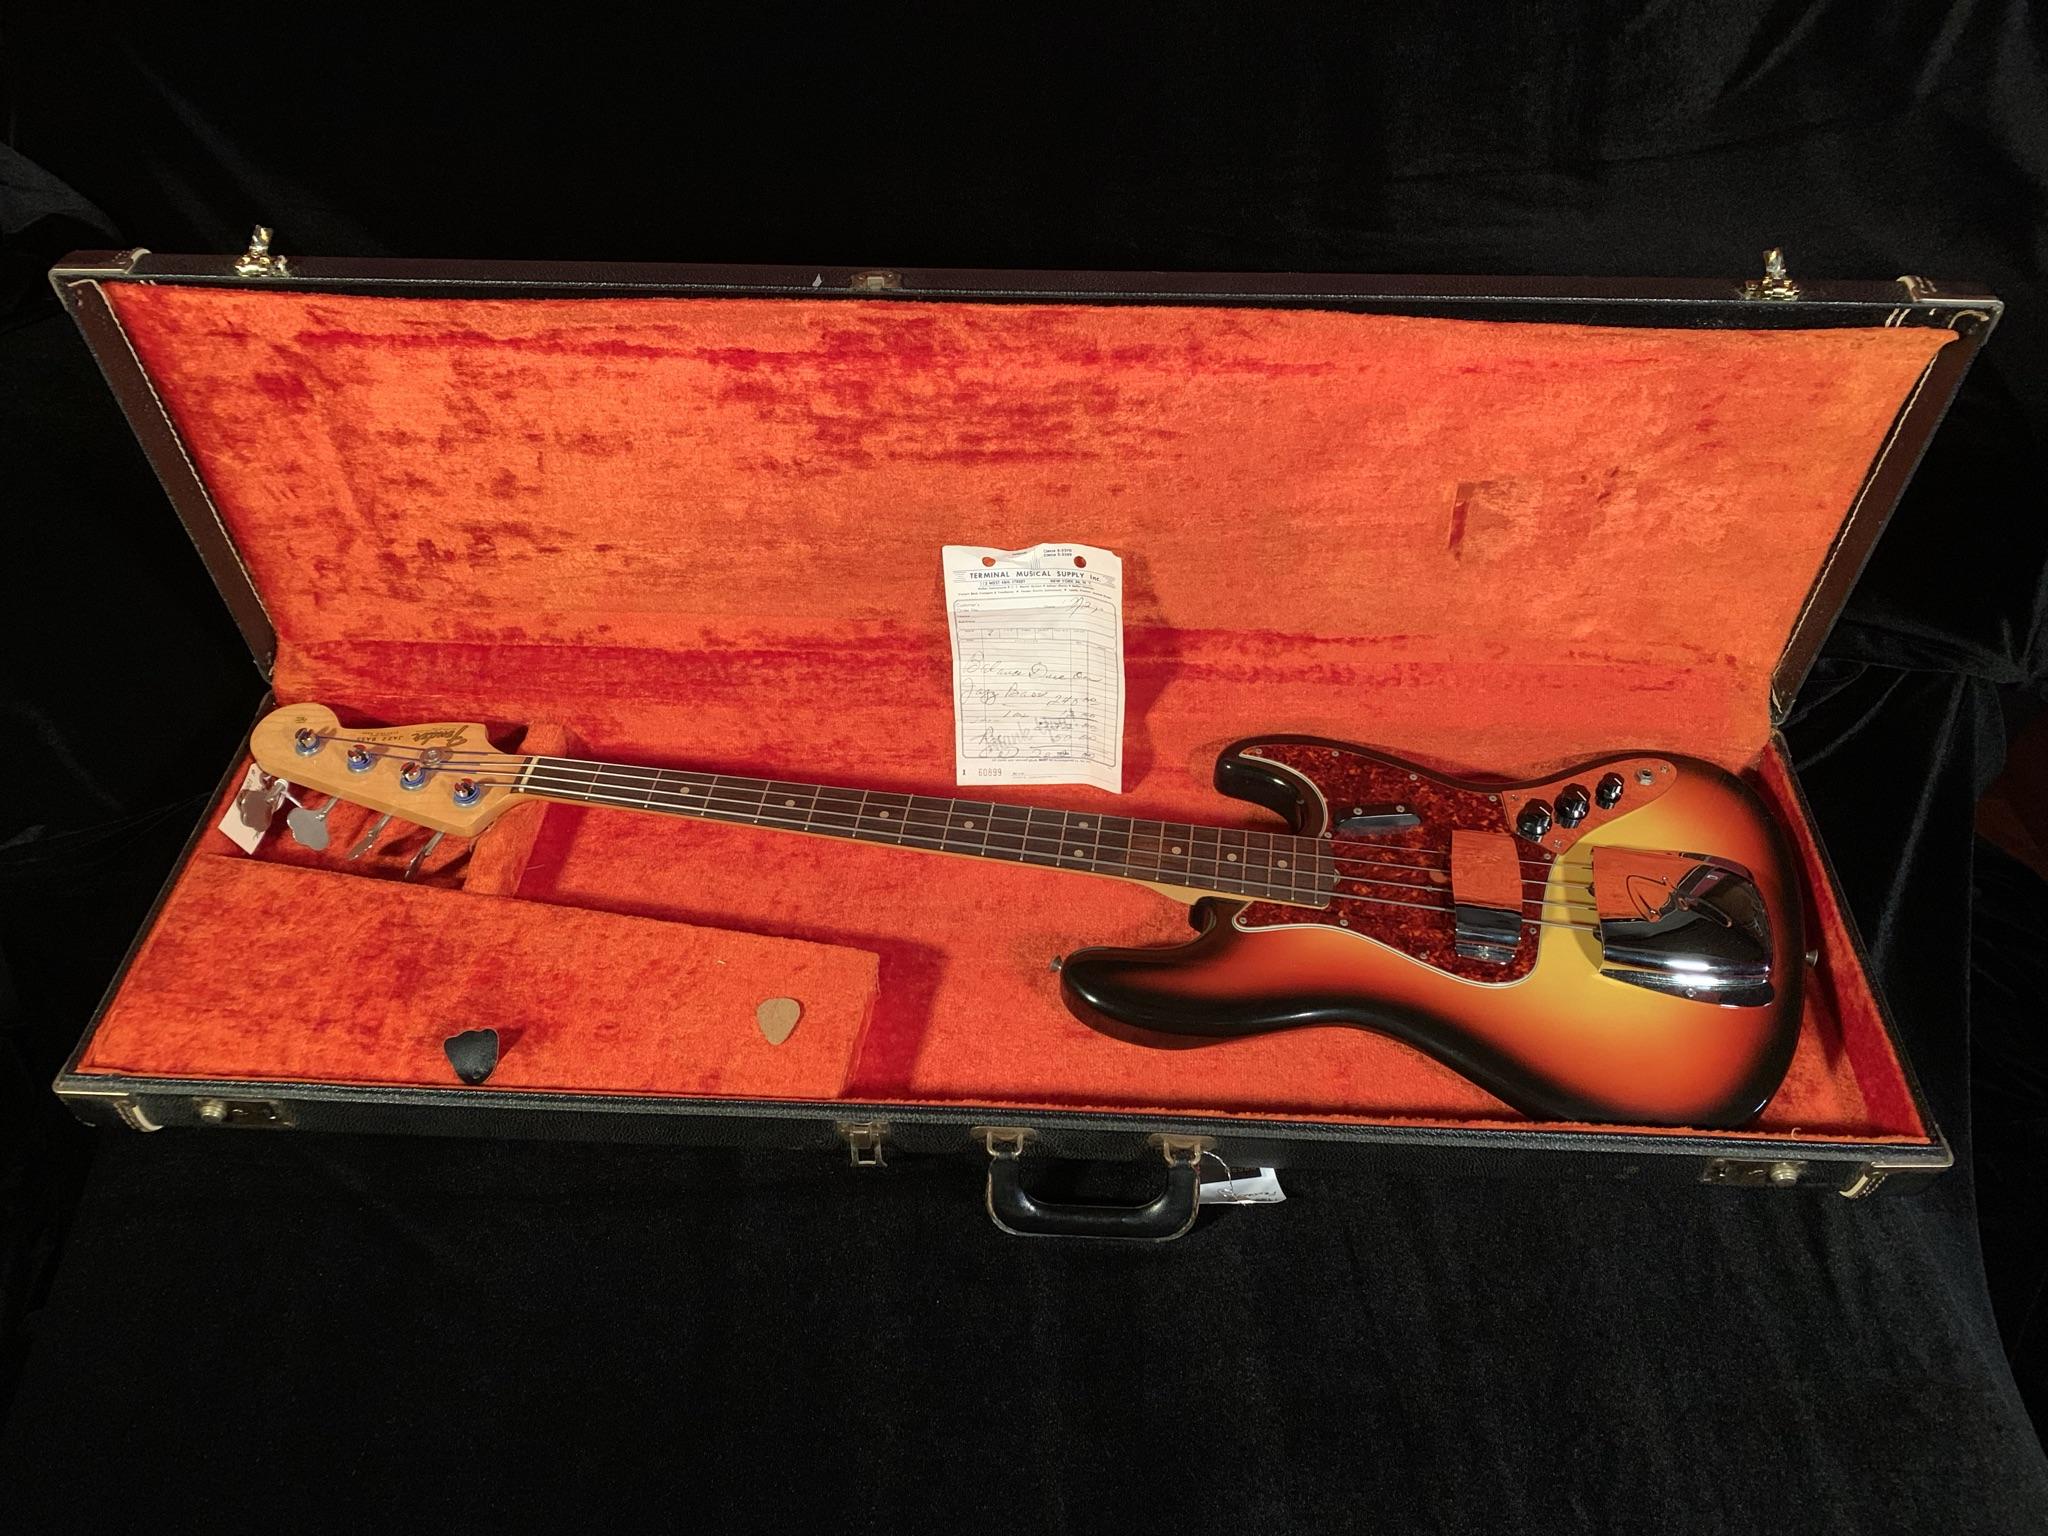 1965 Fender Jazz Bass Sunburst SN# 100423 $15,000.00